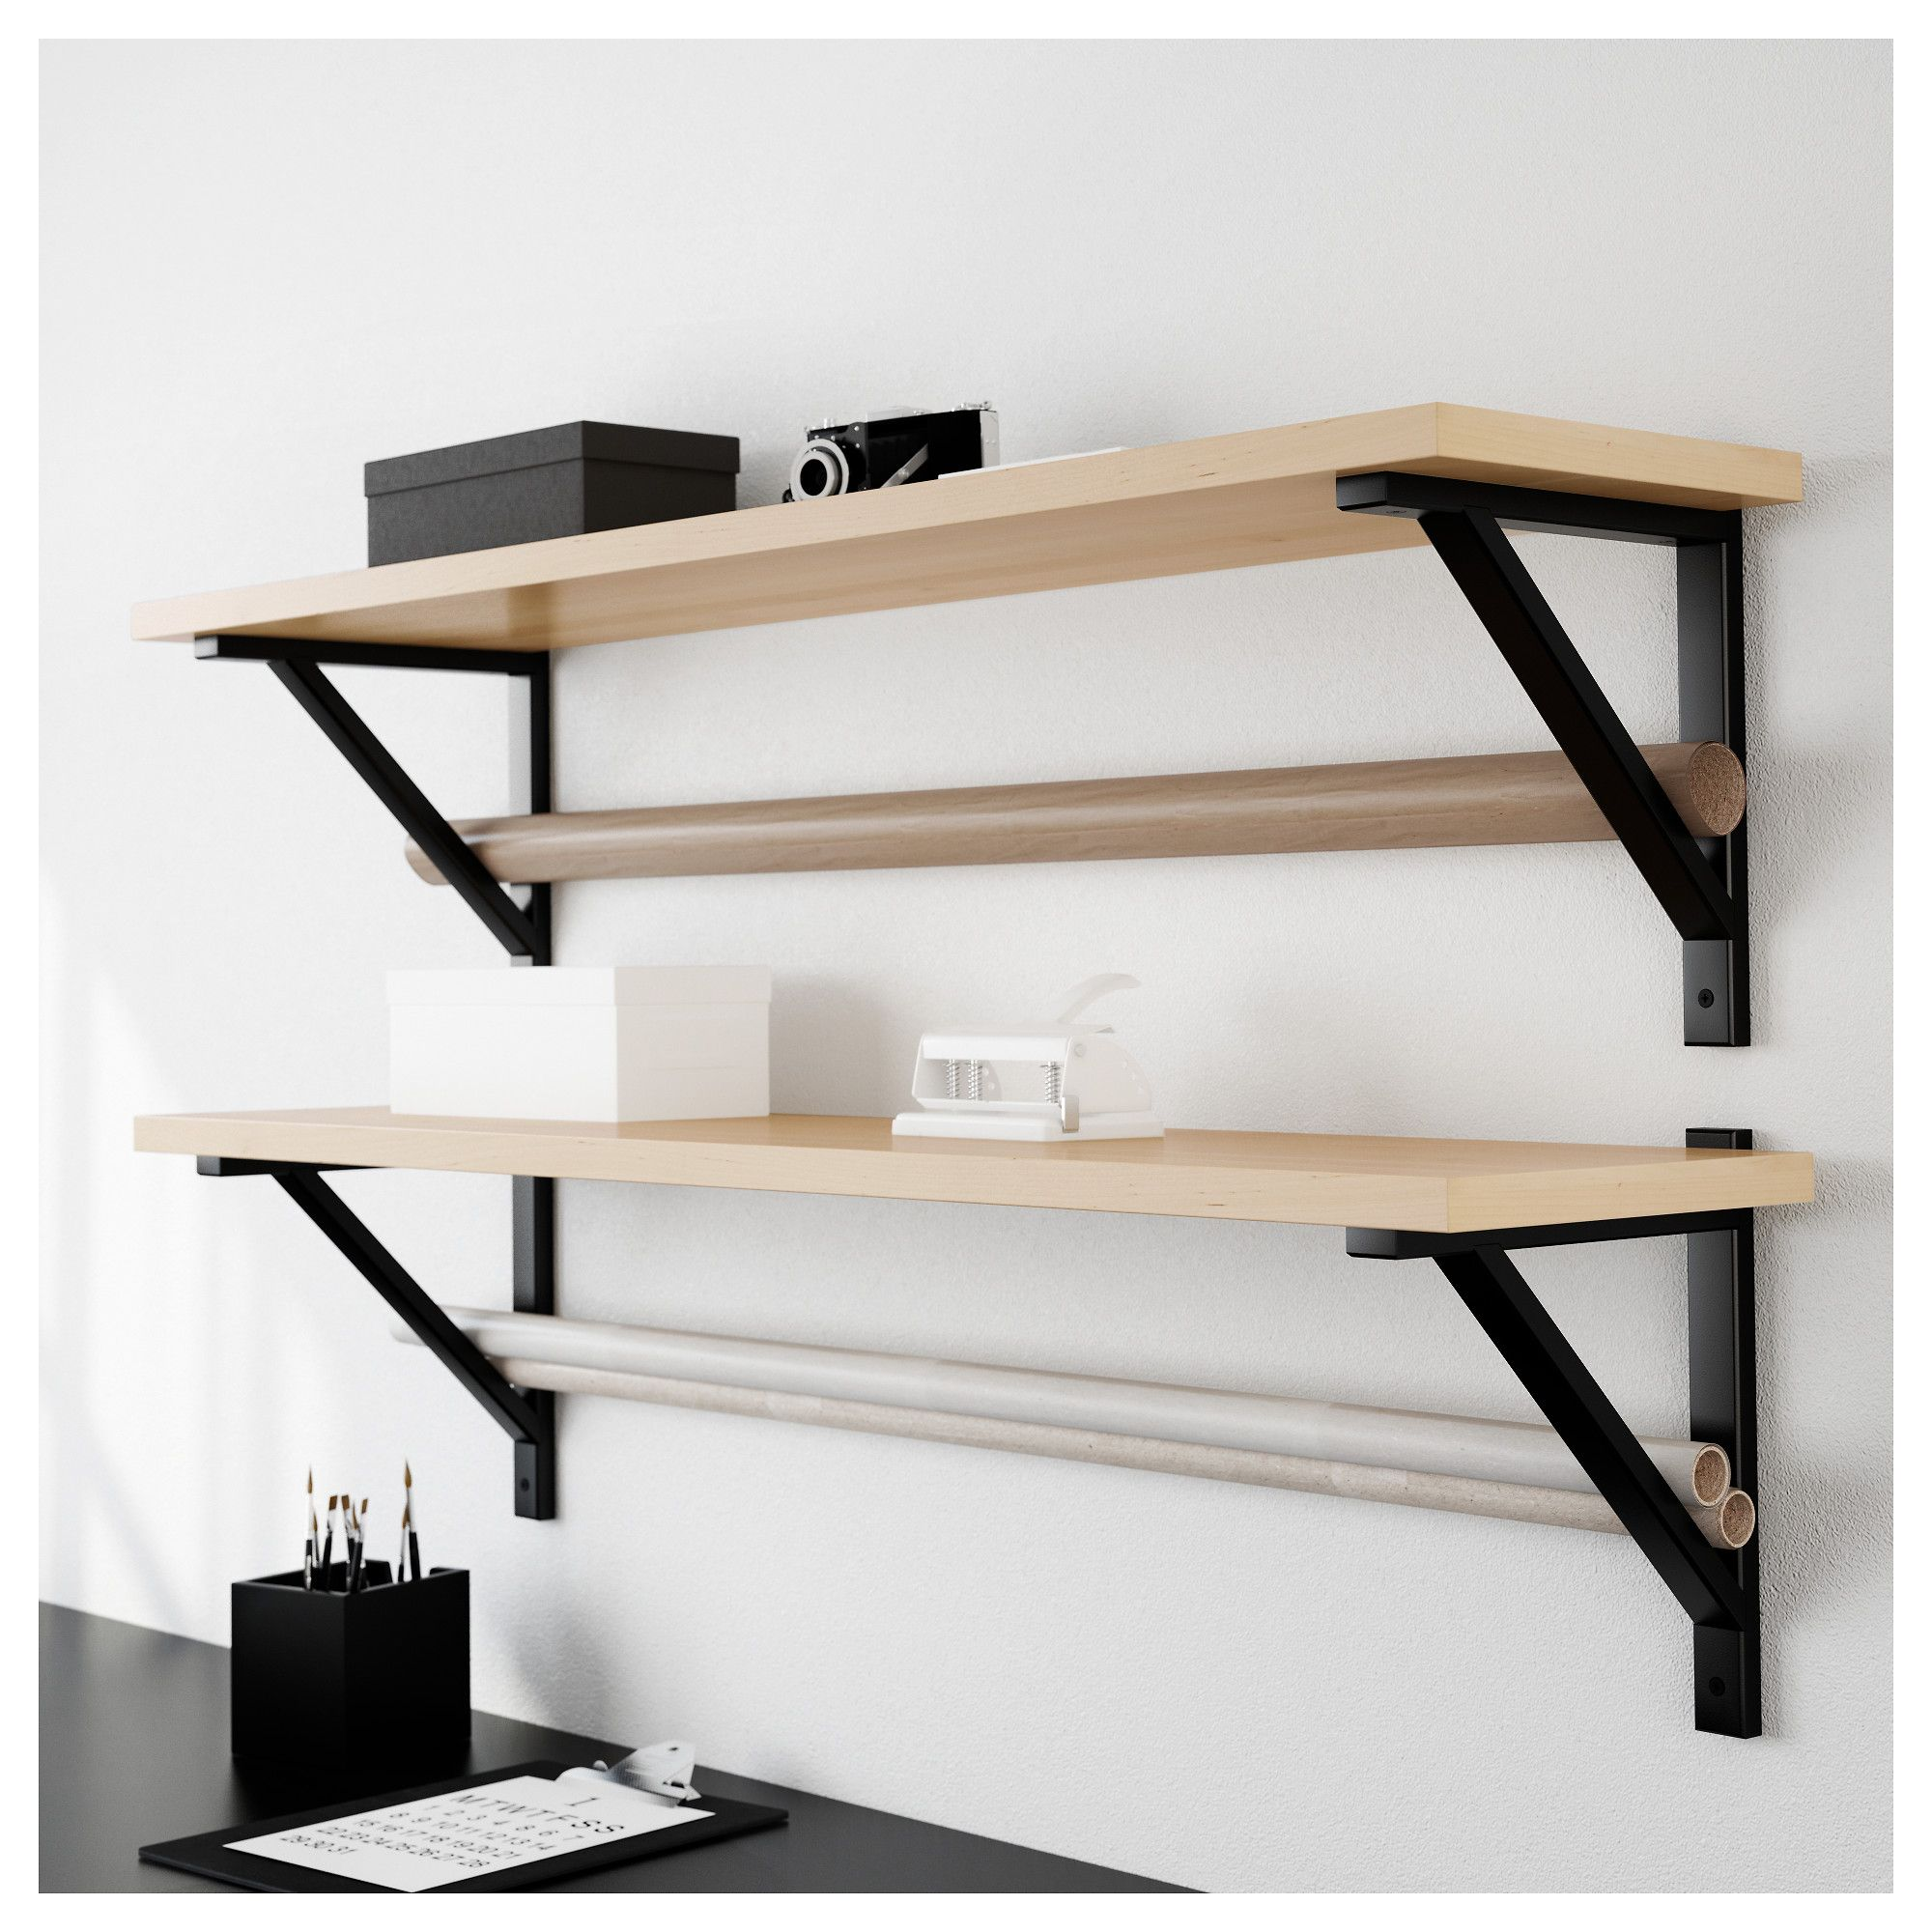 Furniture And Home Furnishings Ikea Ekby Shelves Wall Shelving